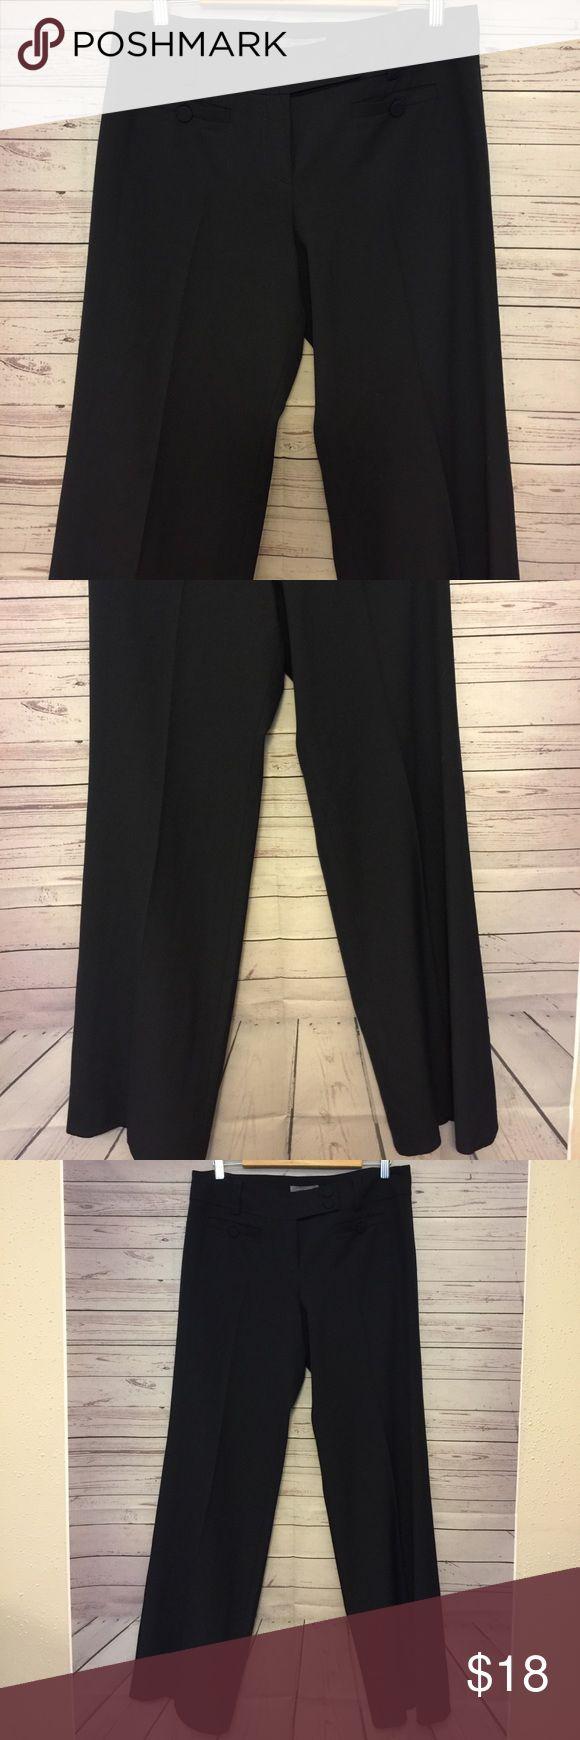 Ann Taylor Women's SZ 8 navy blue dress pants Gently used no flaws waist 17 in Length 41 in inseam 33 in Ann Taylor Pants